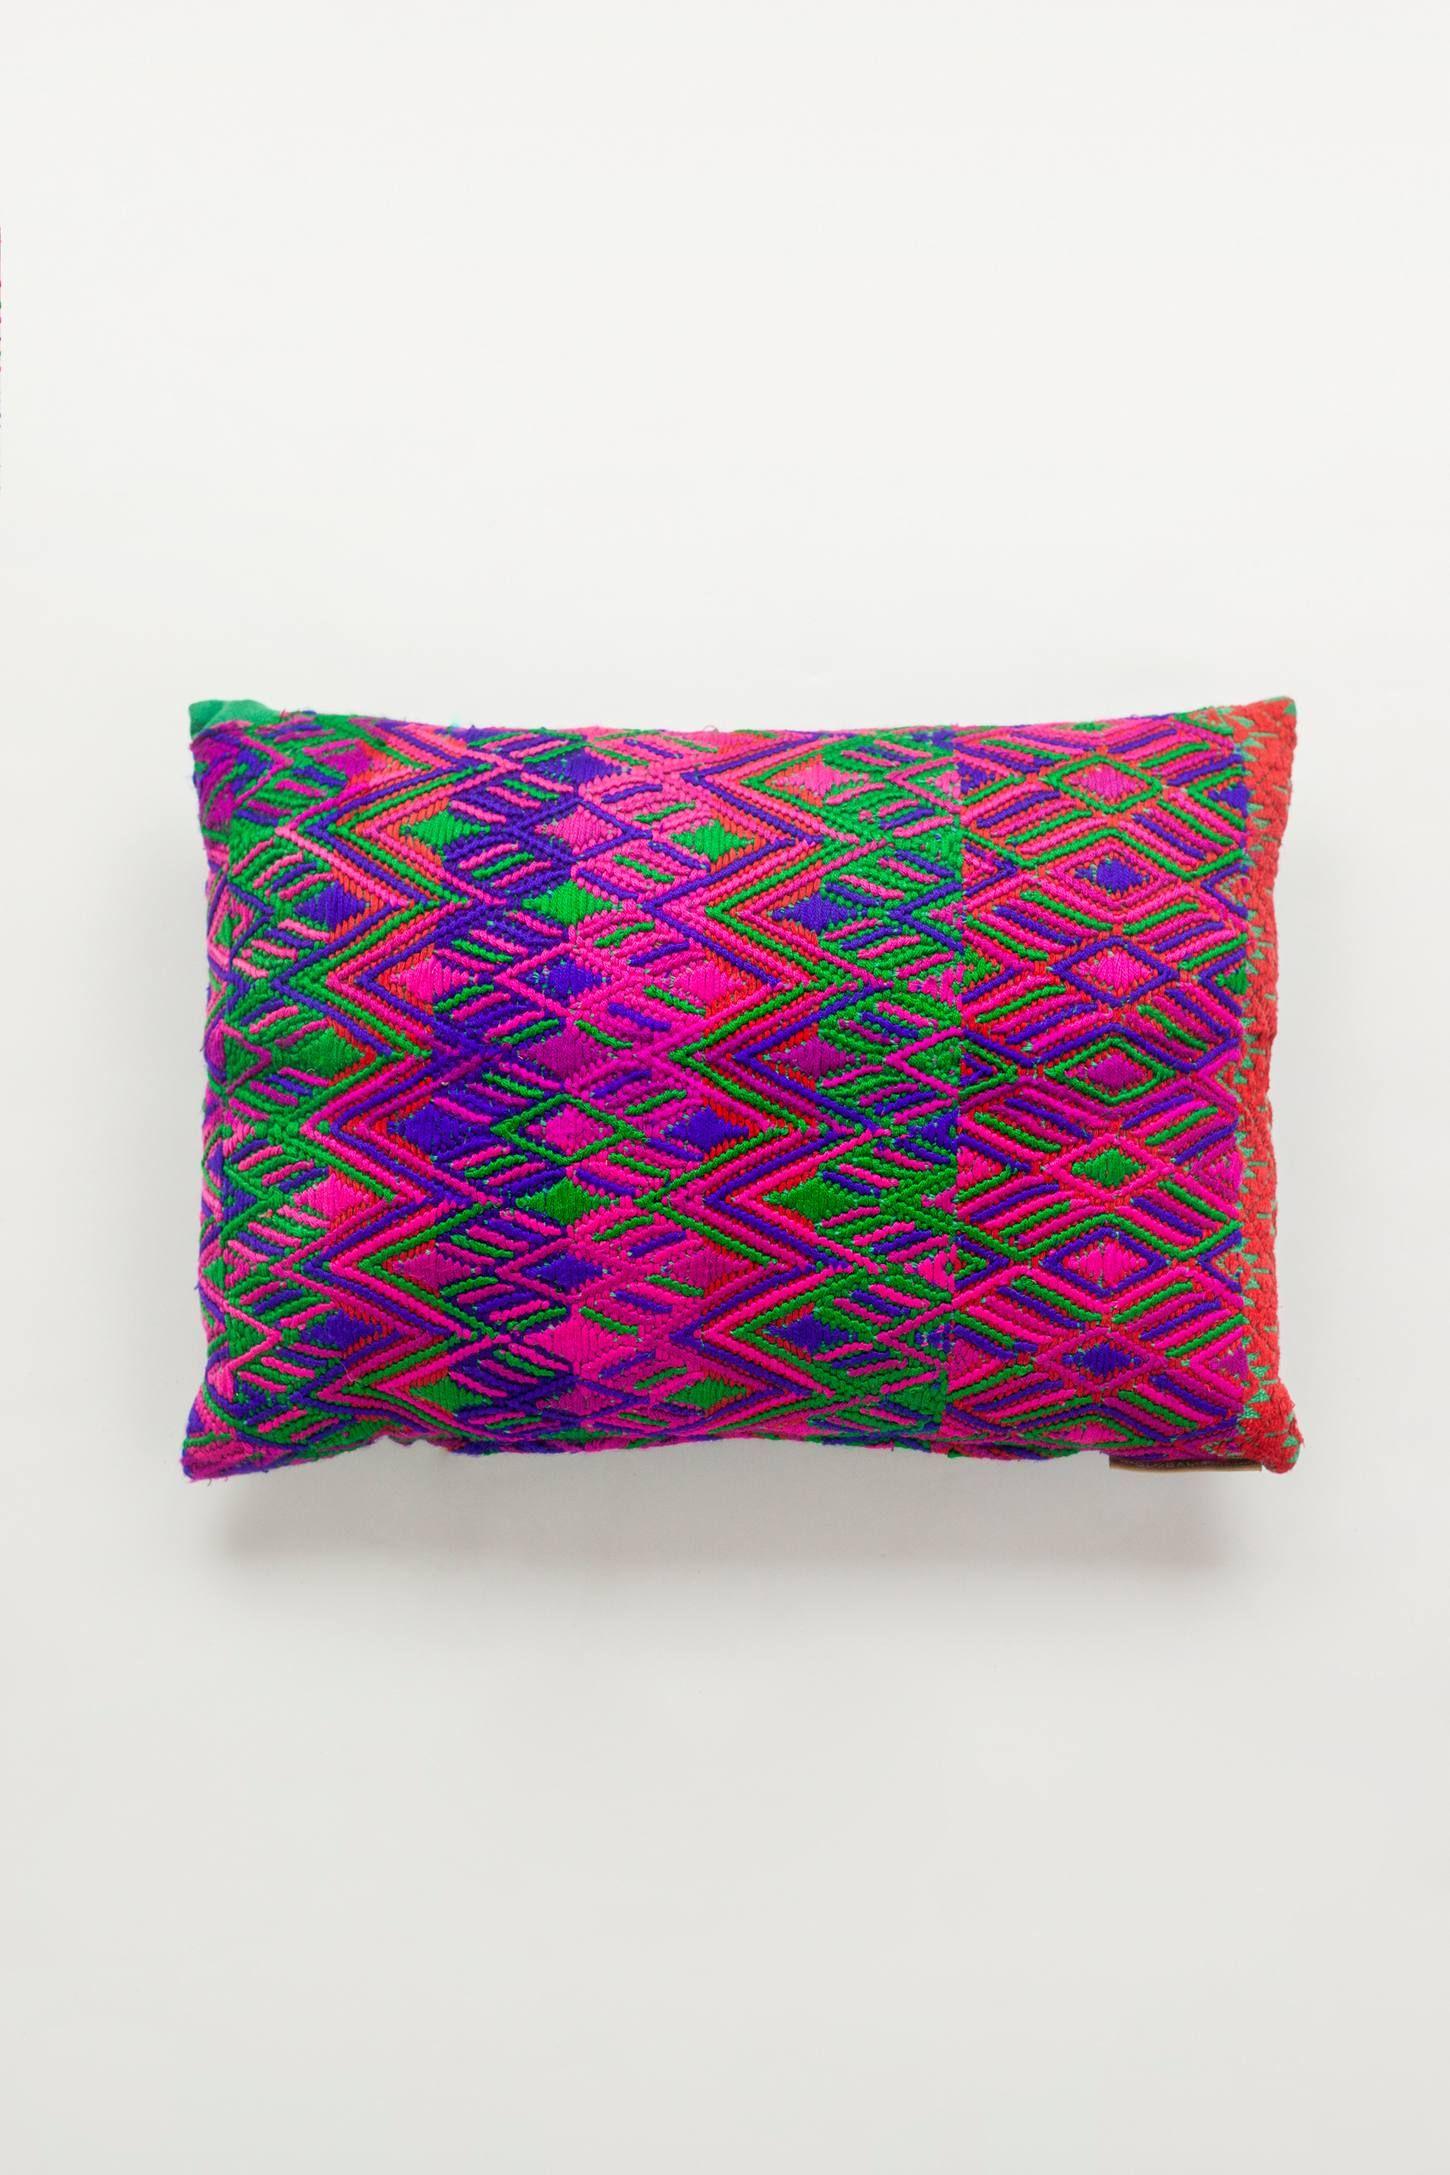 The Global Trunk Mayan Heirloom Pillow Mas Gsu Trunks Pillows